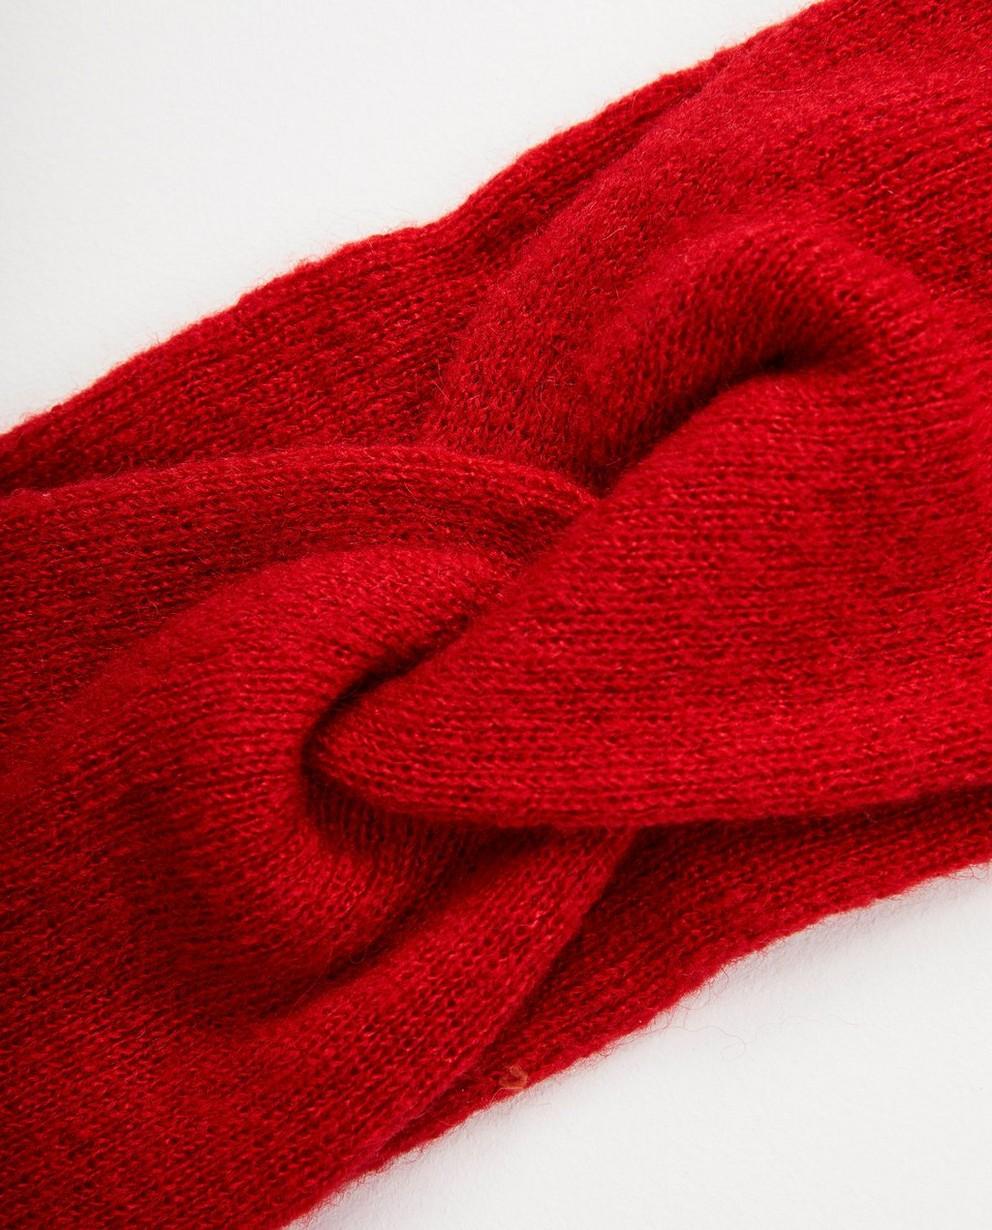 Strickware - Dunkelrot - Rotes Stirnband